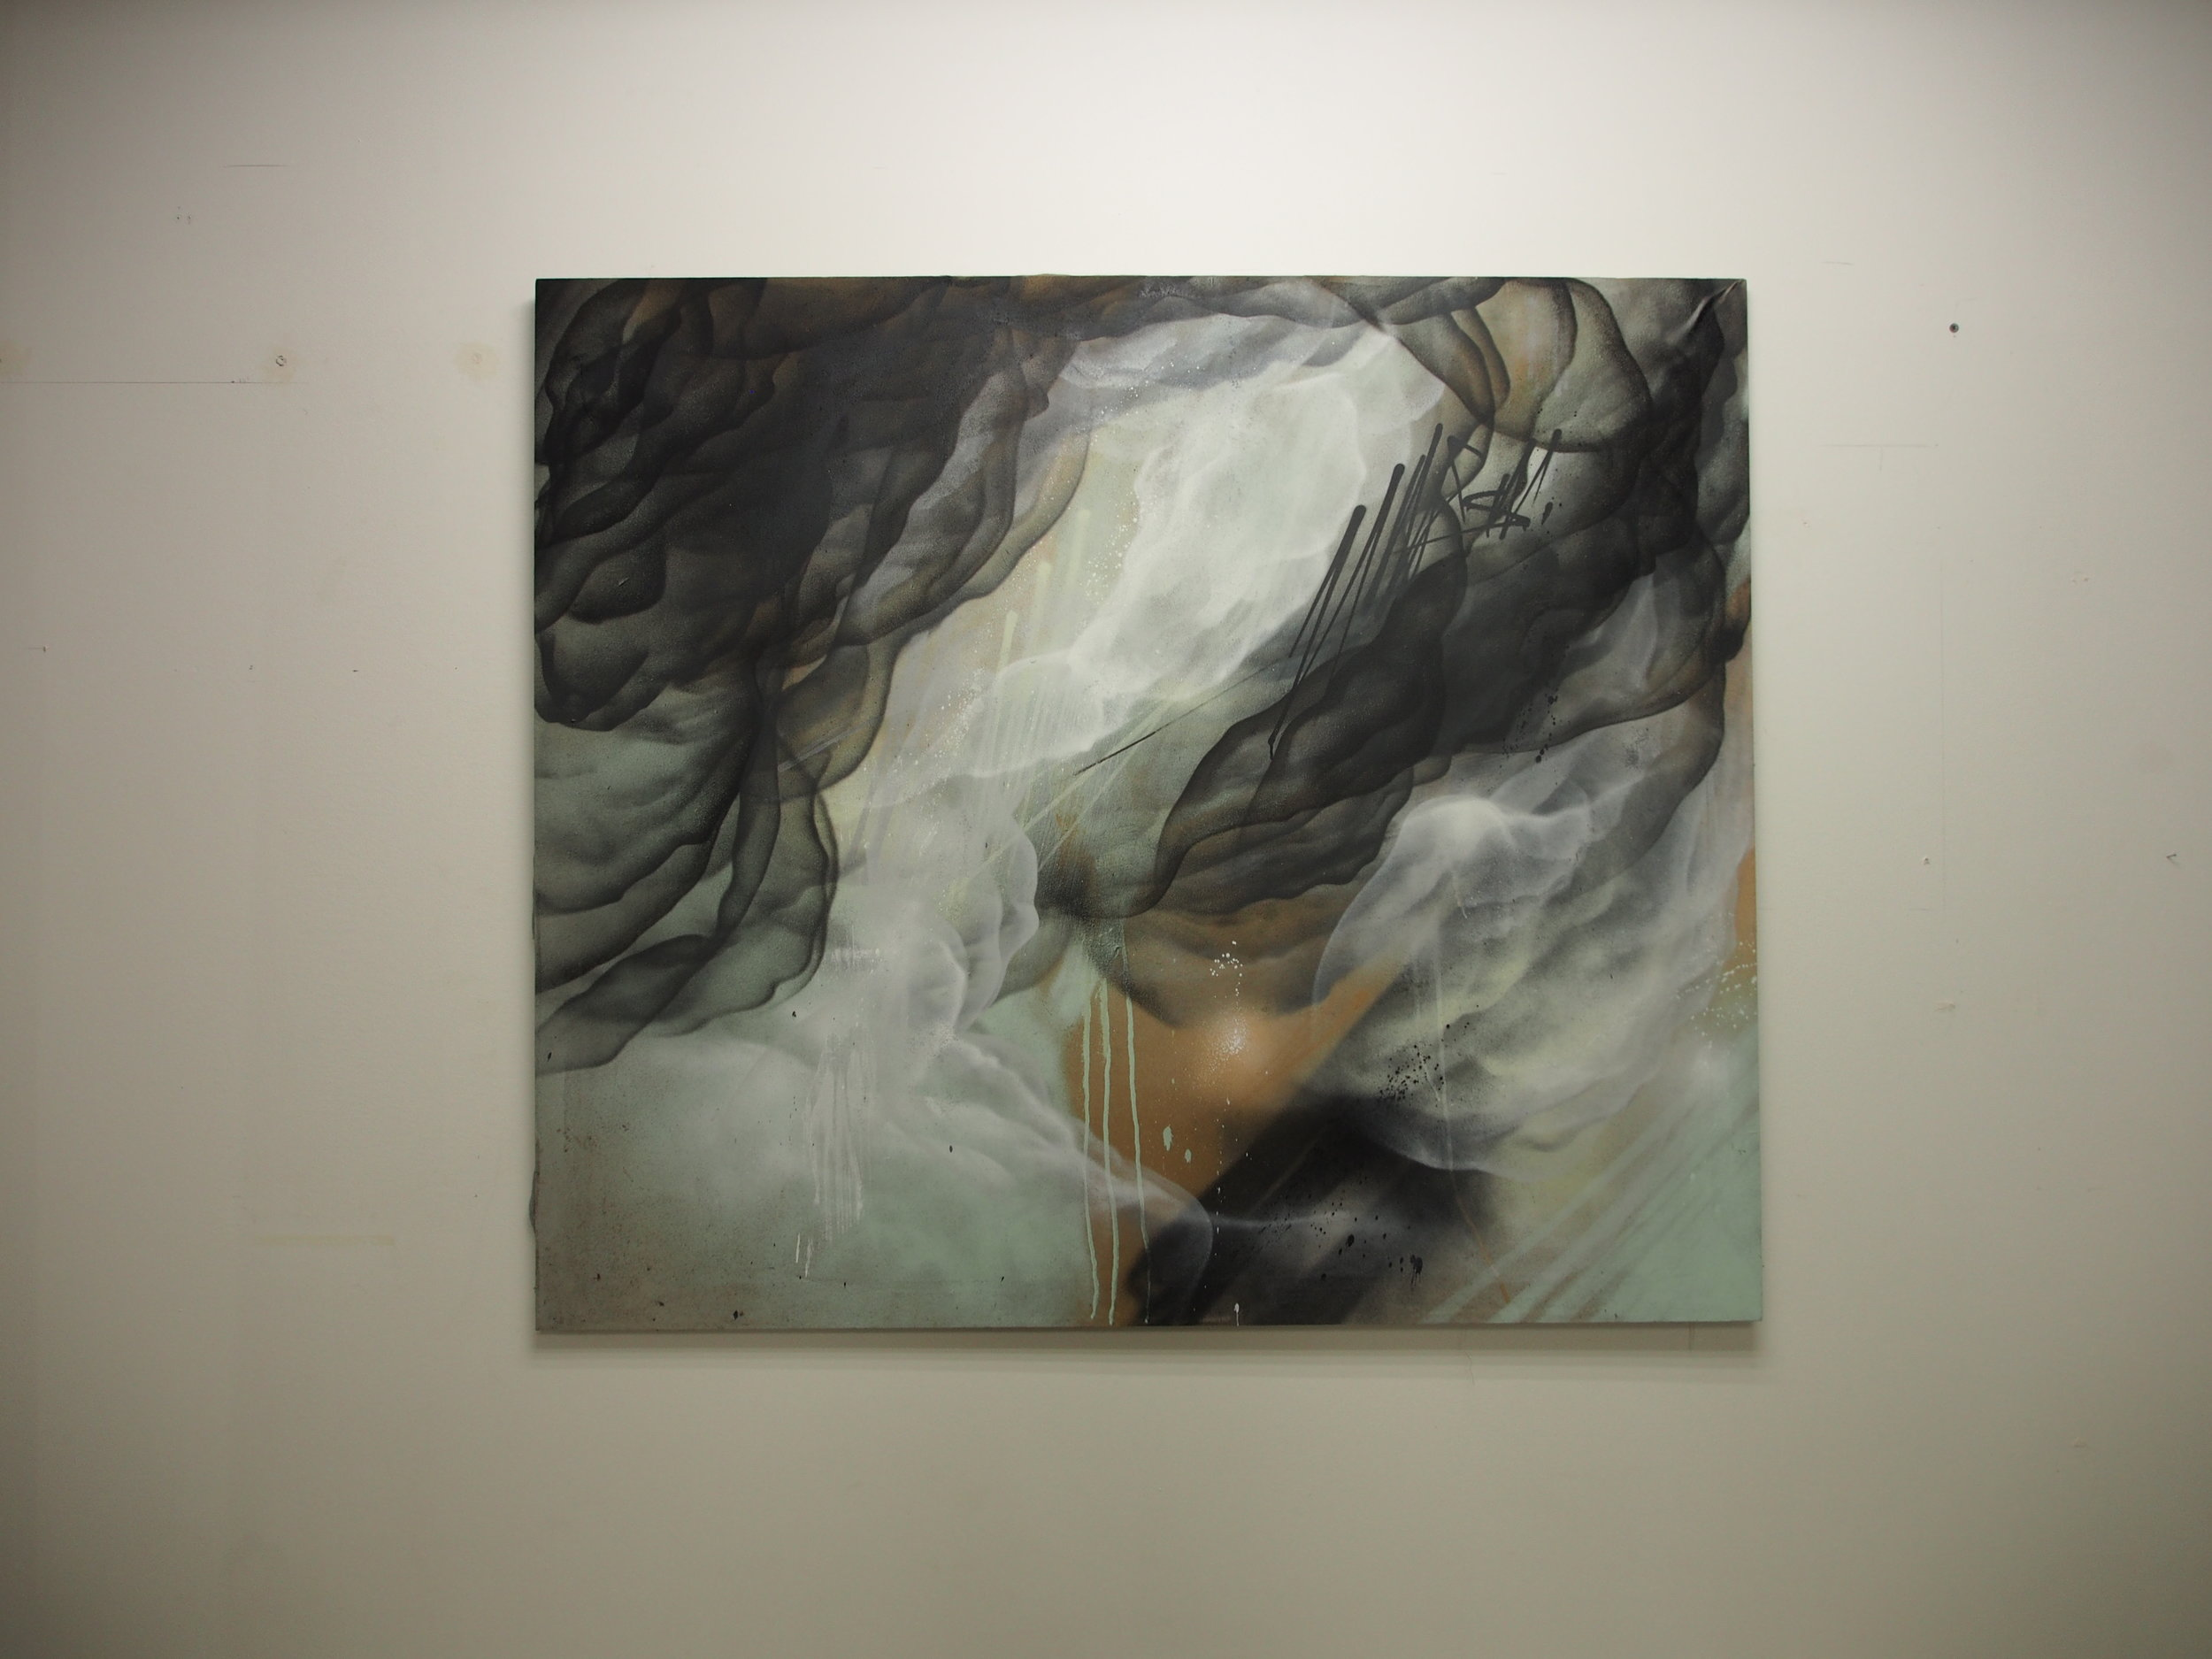 I - 150x170cm - Spray on canvas